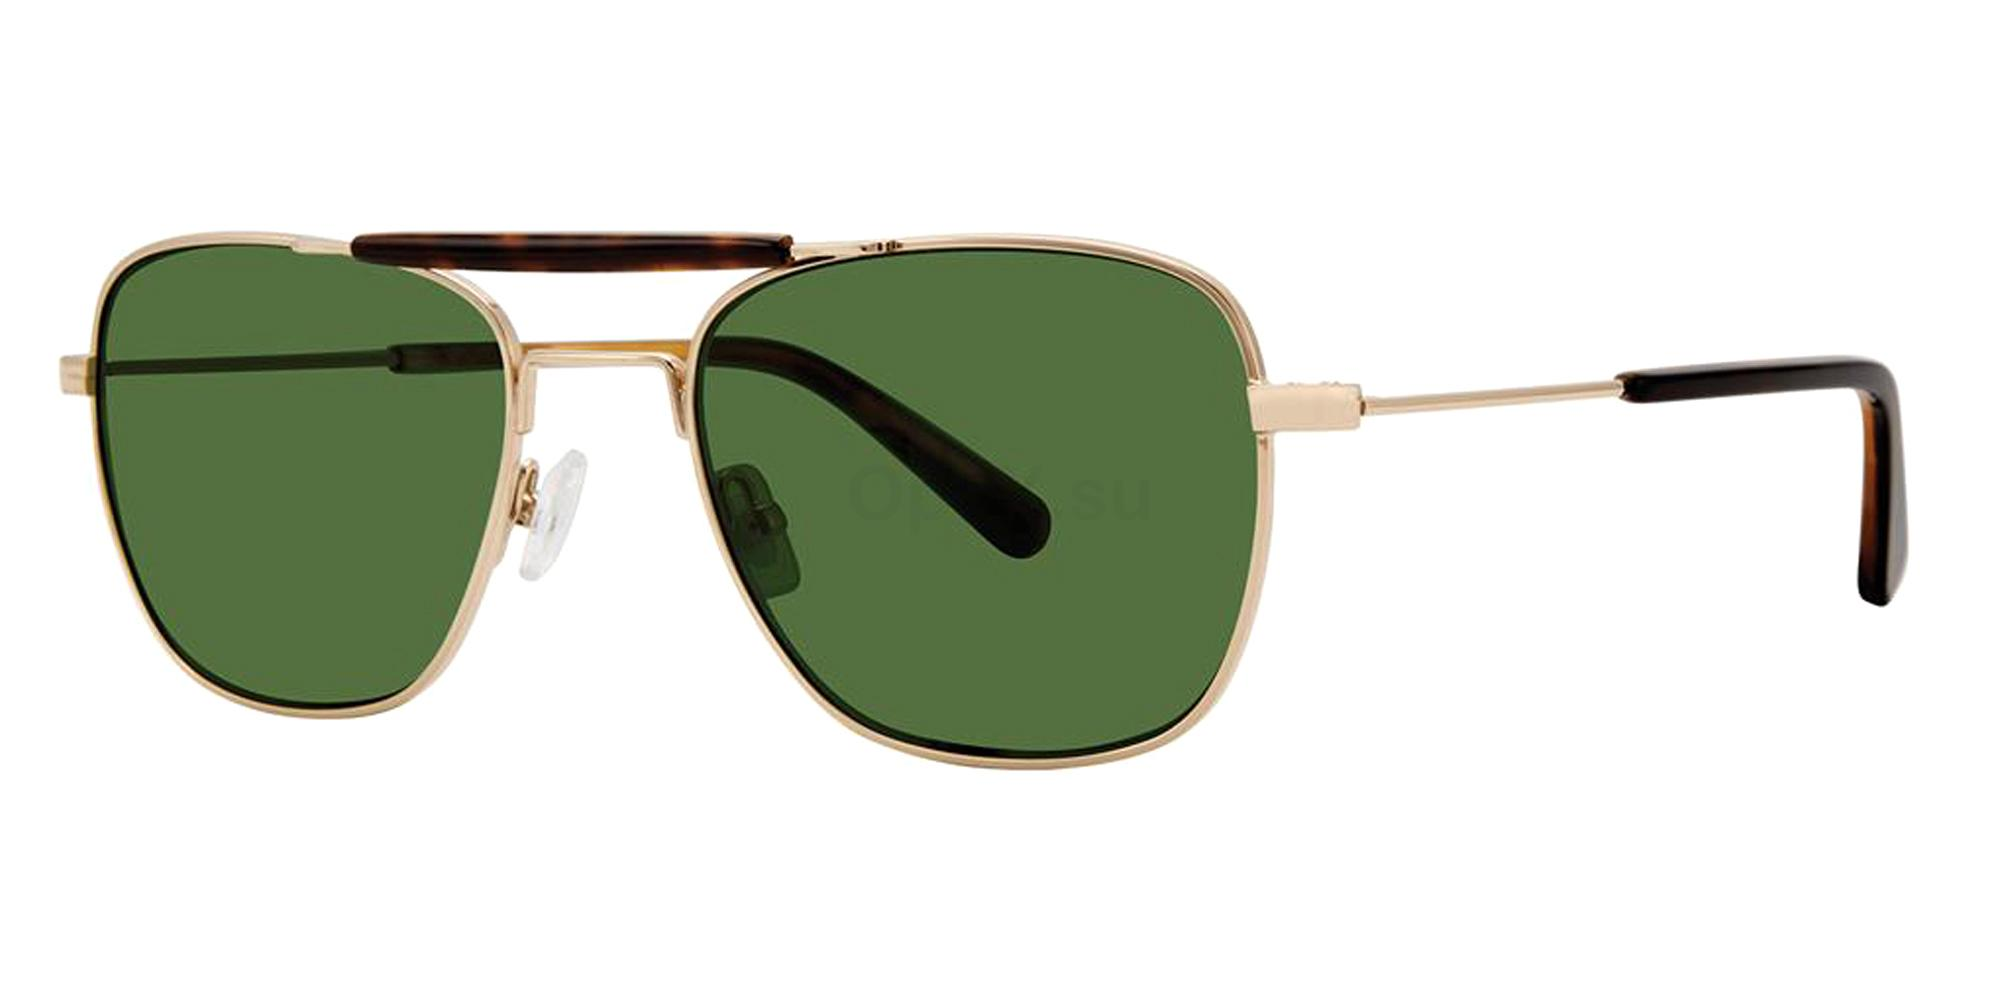 Gold BROCK Sunglasses, Zac Posen